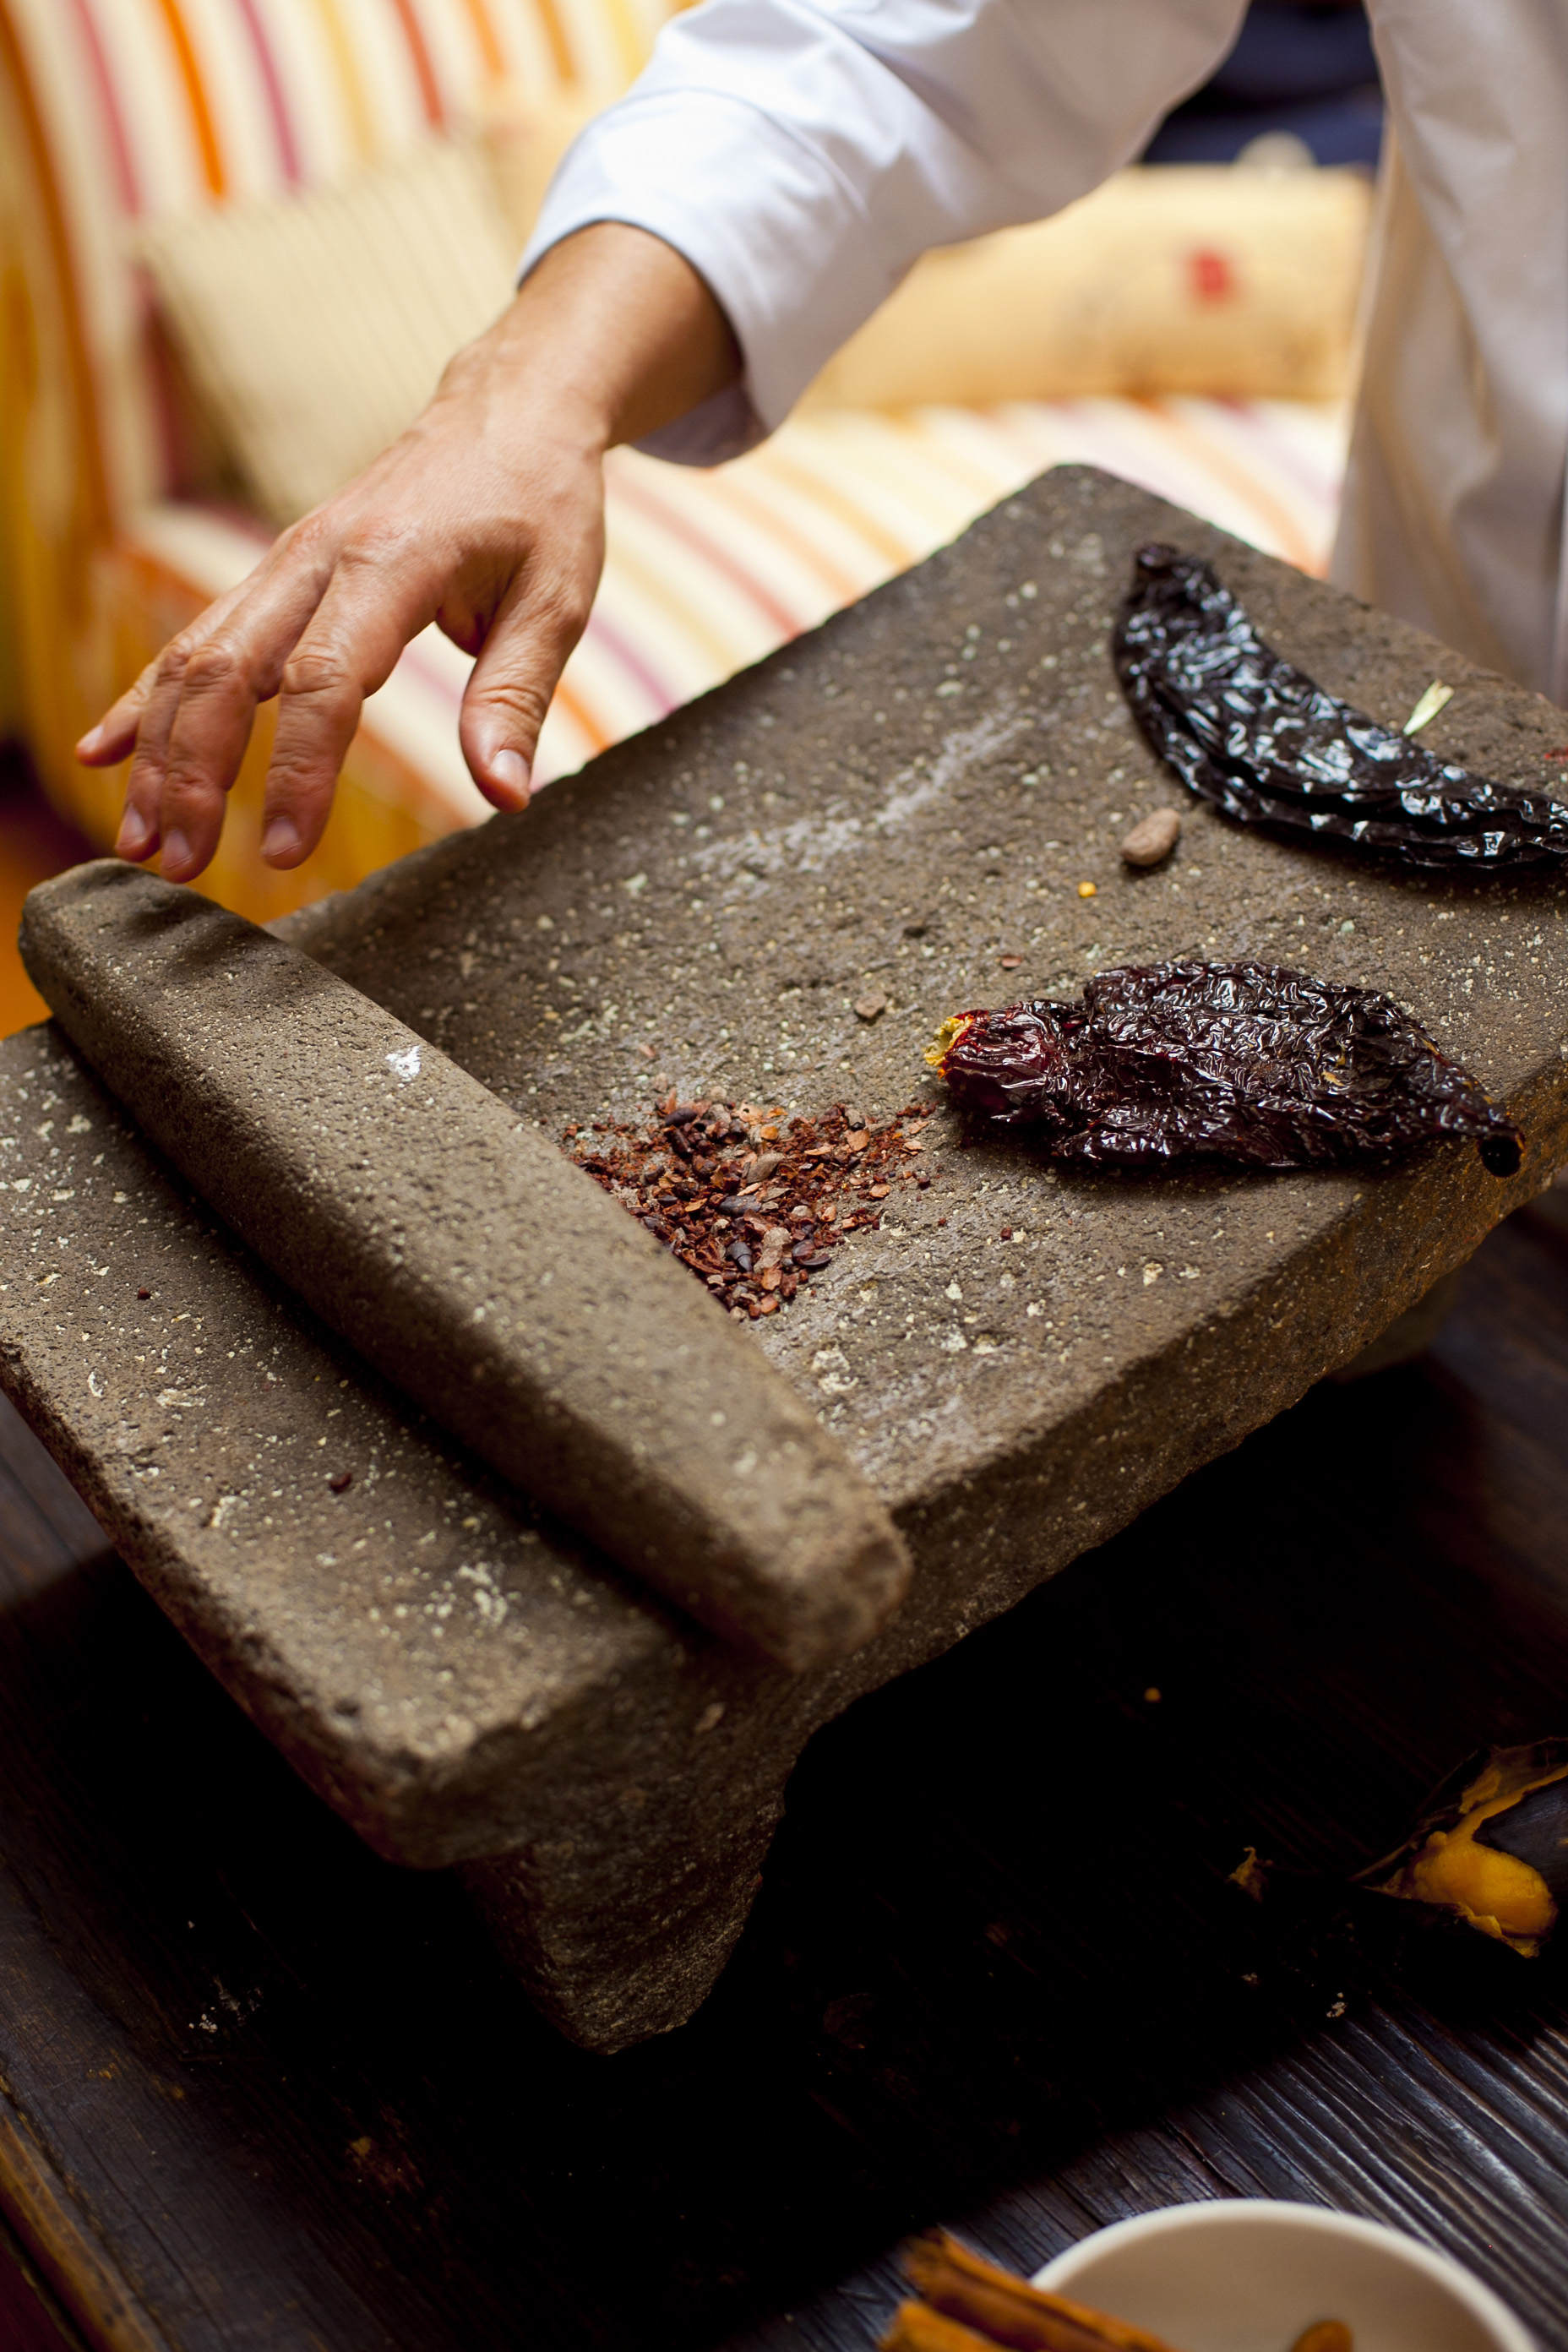 crushing chilis on a stone metate